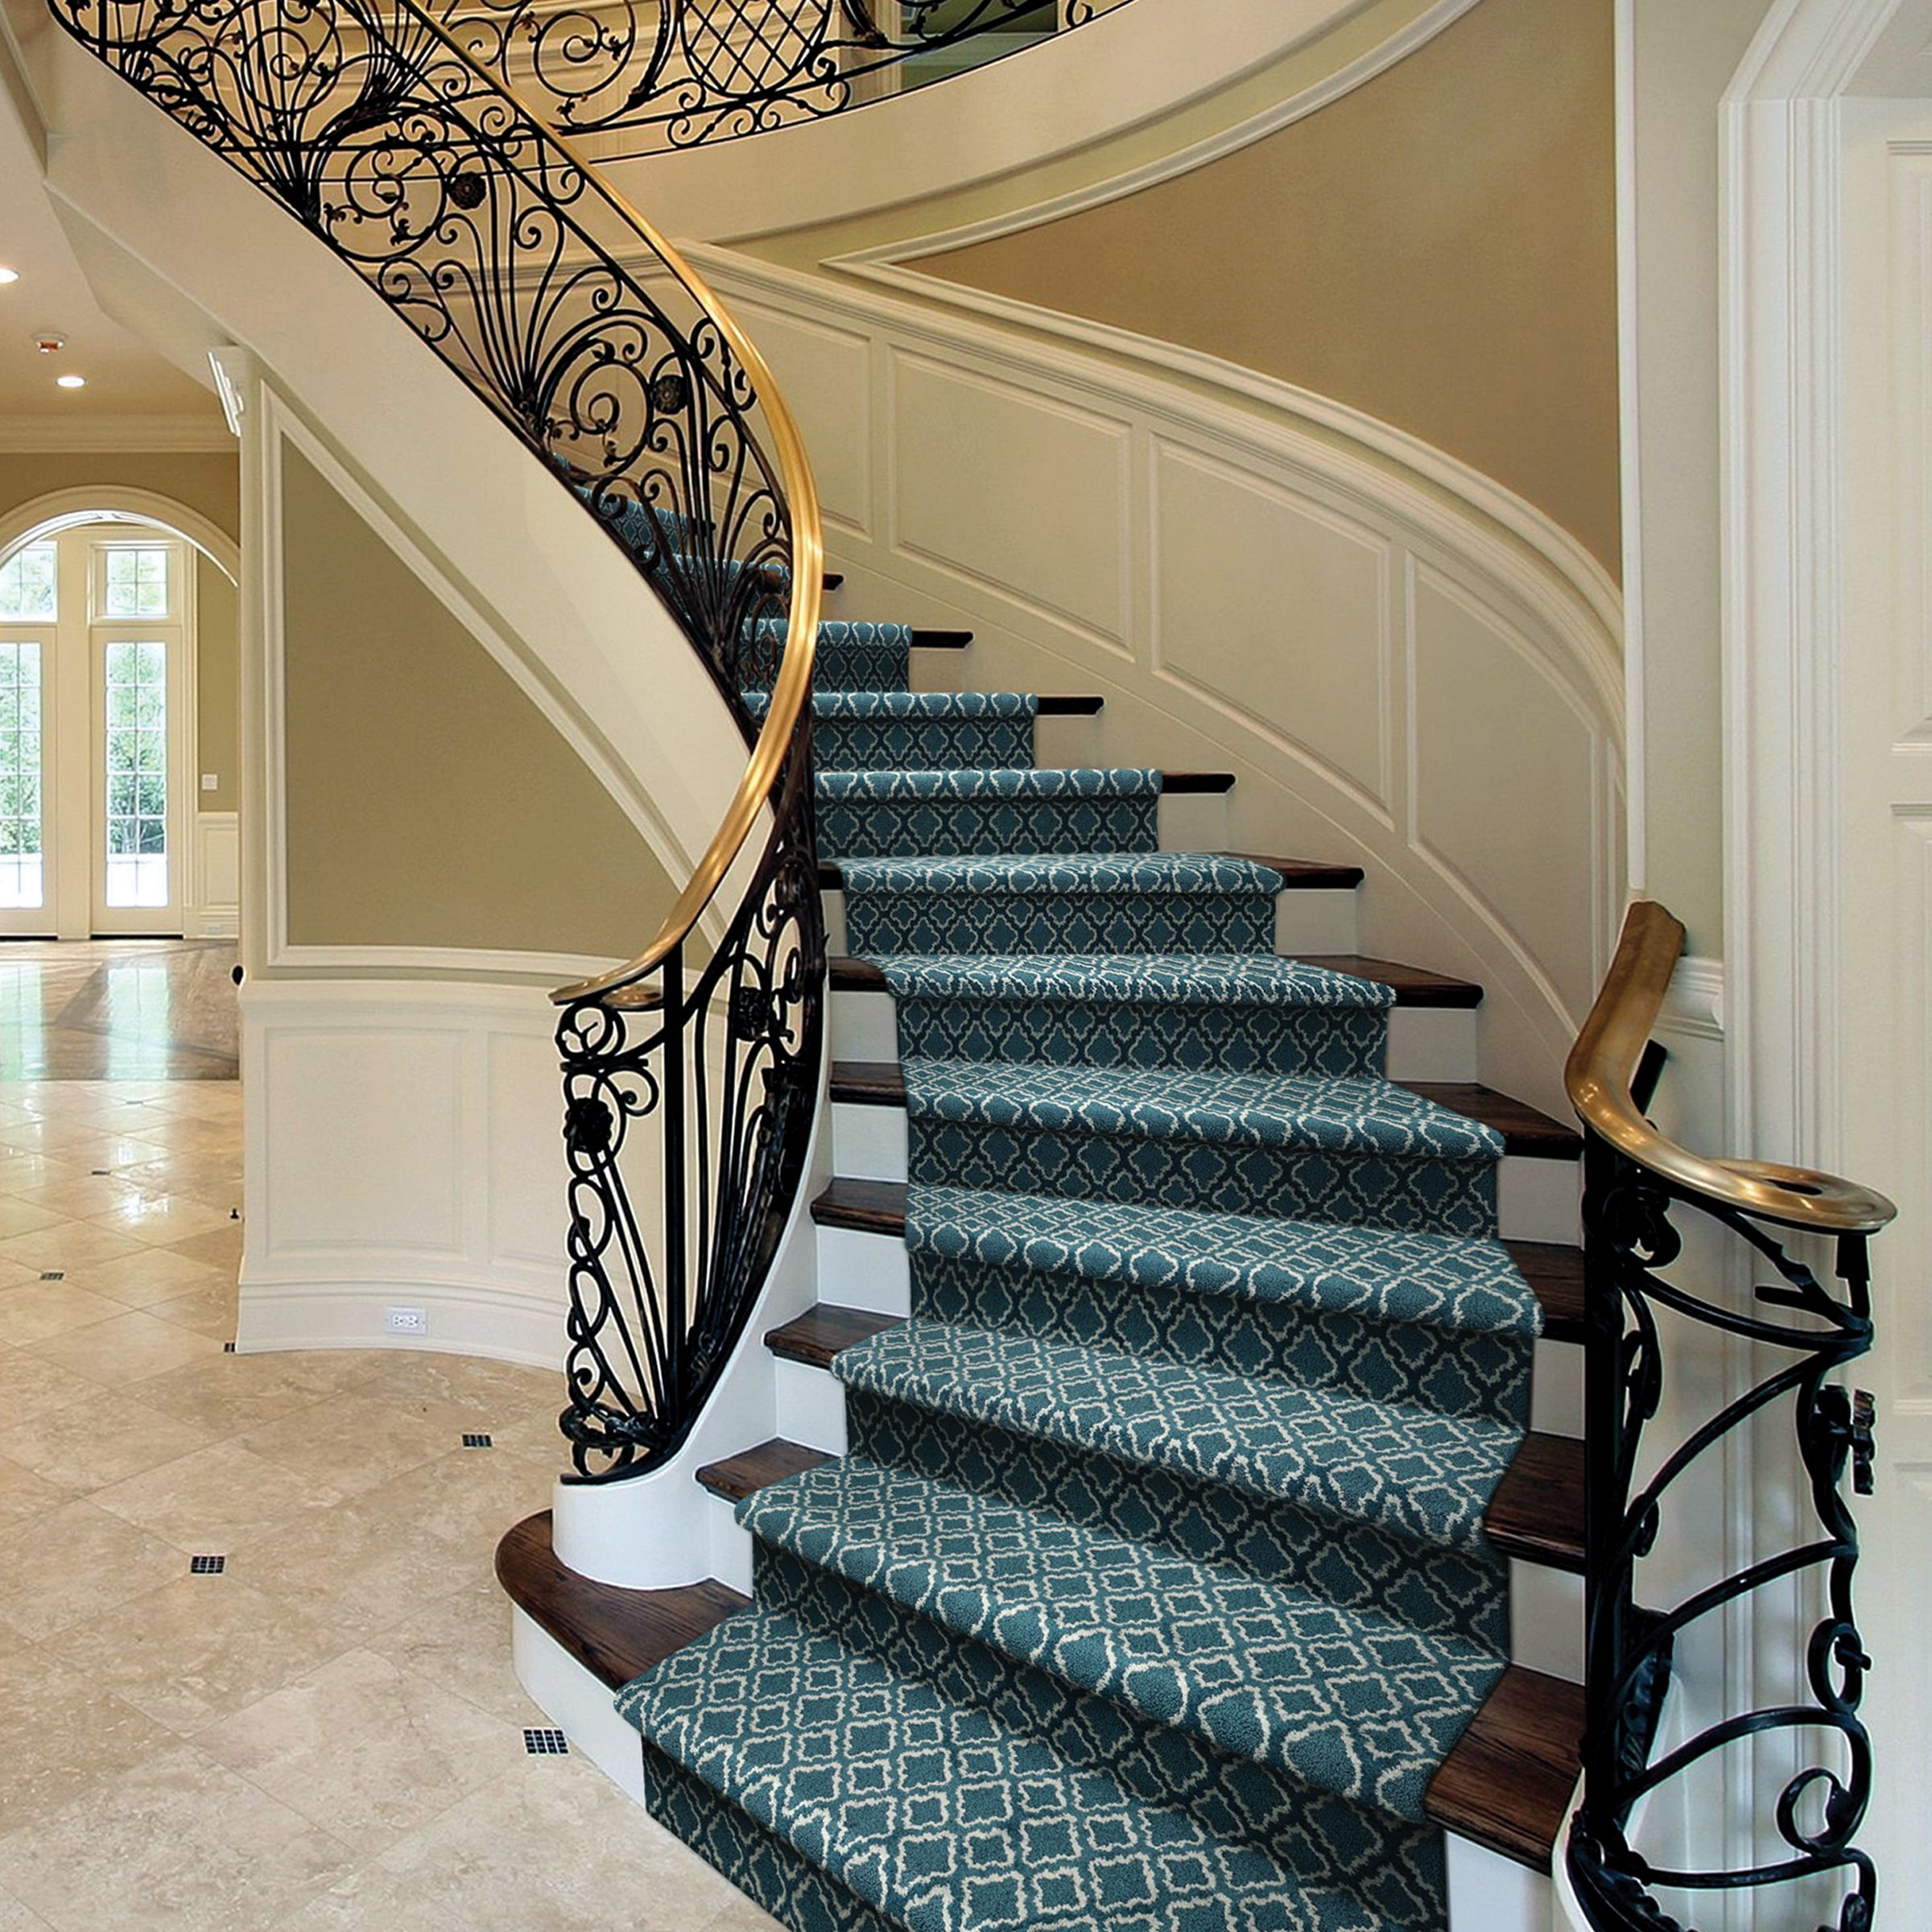 Tuftex Chateau Stainmaster Carpet Carpet Flooring